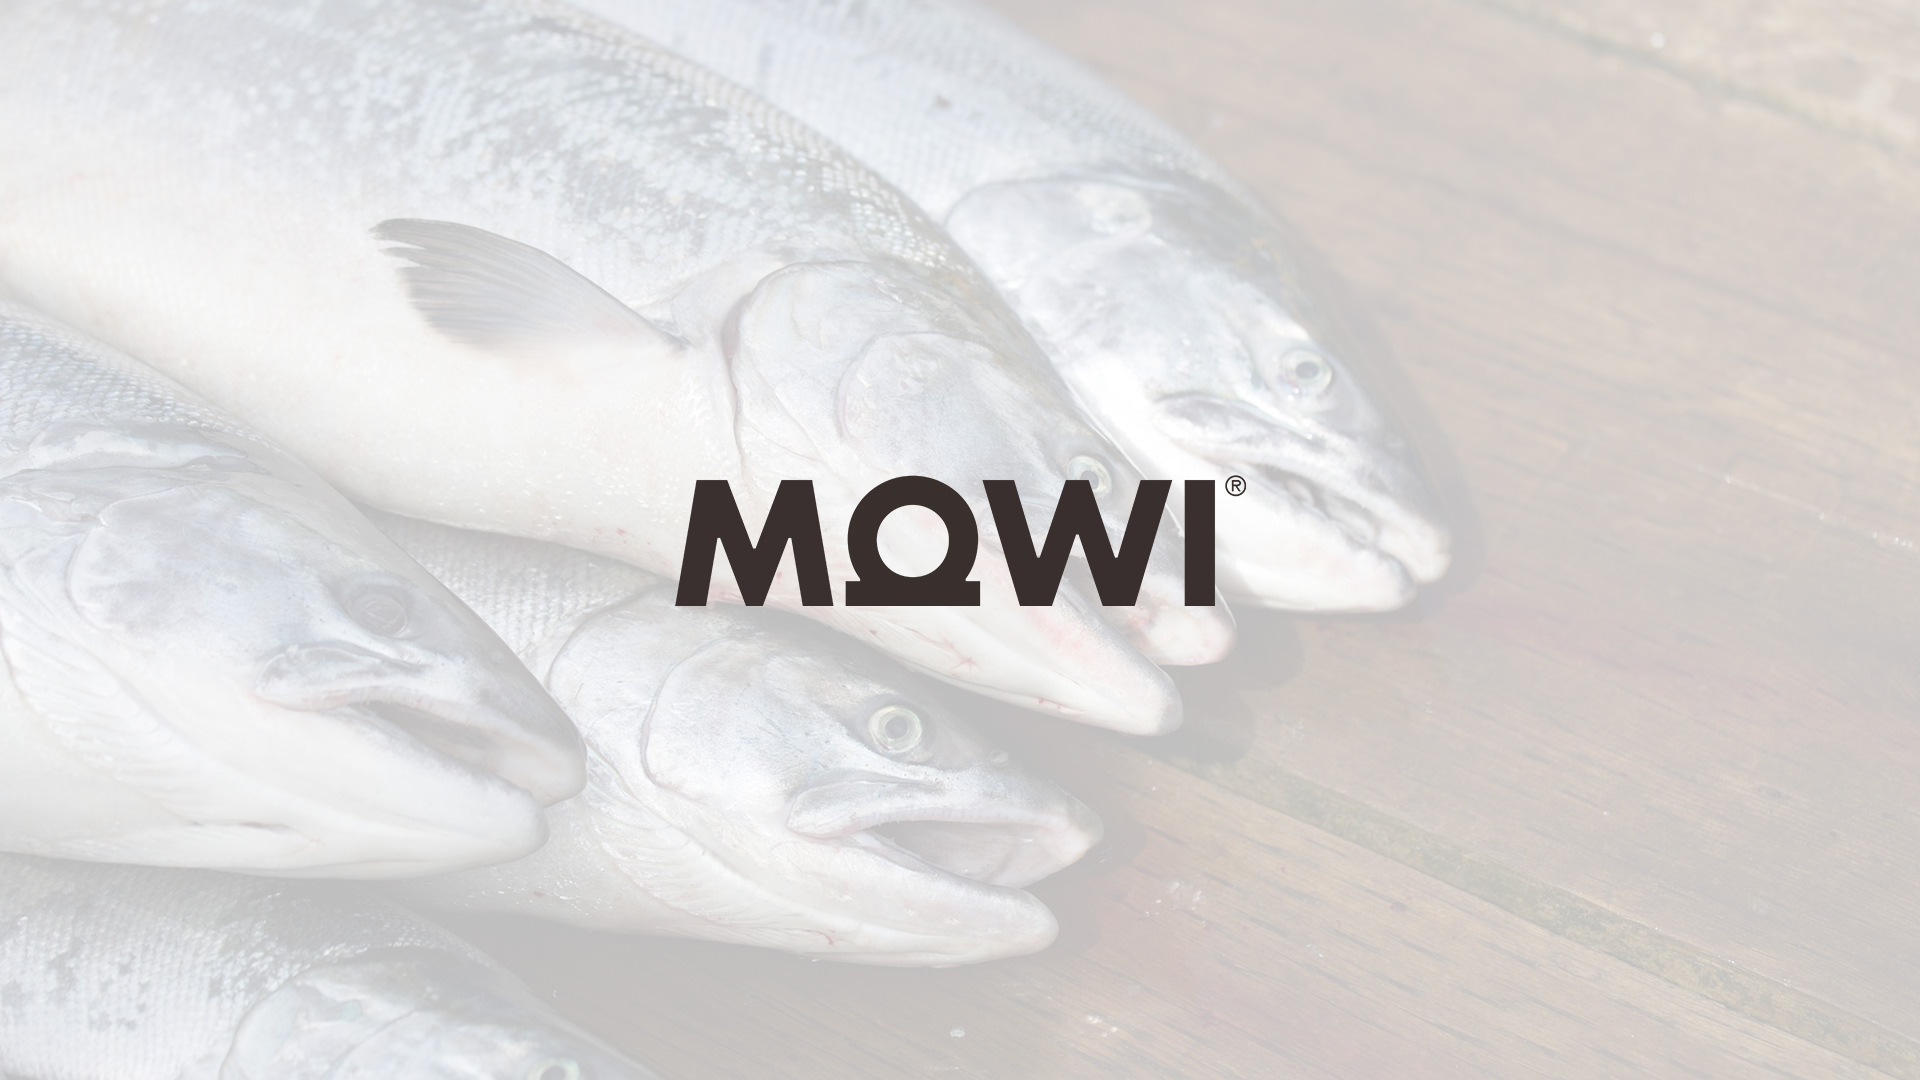 atlantic-salmon-antitrust-class-action.jpg